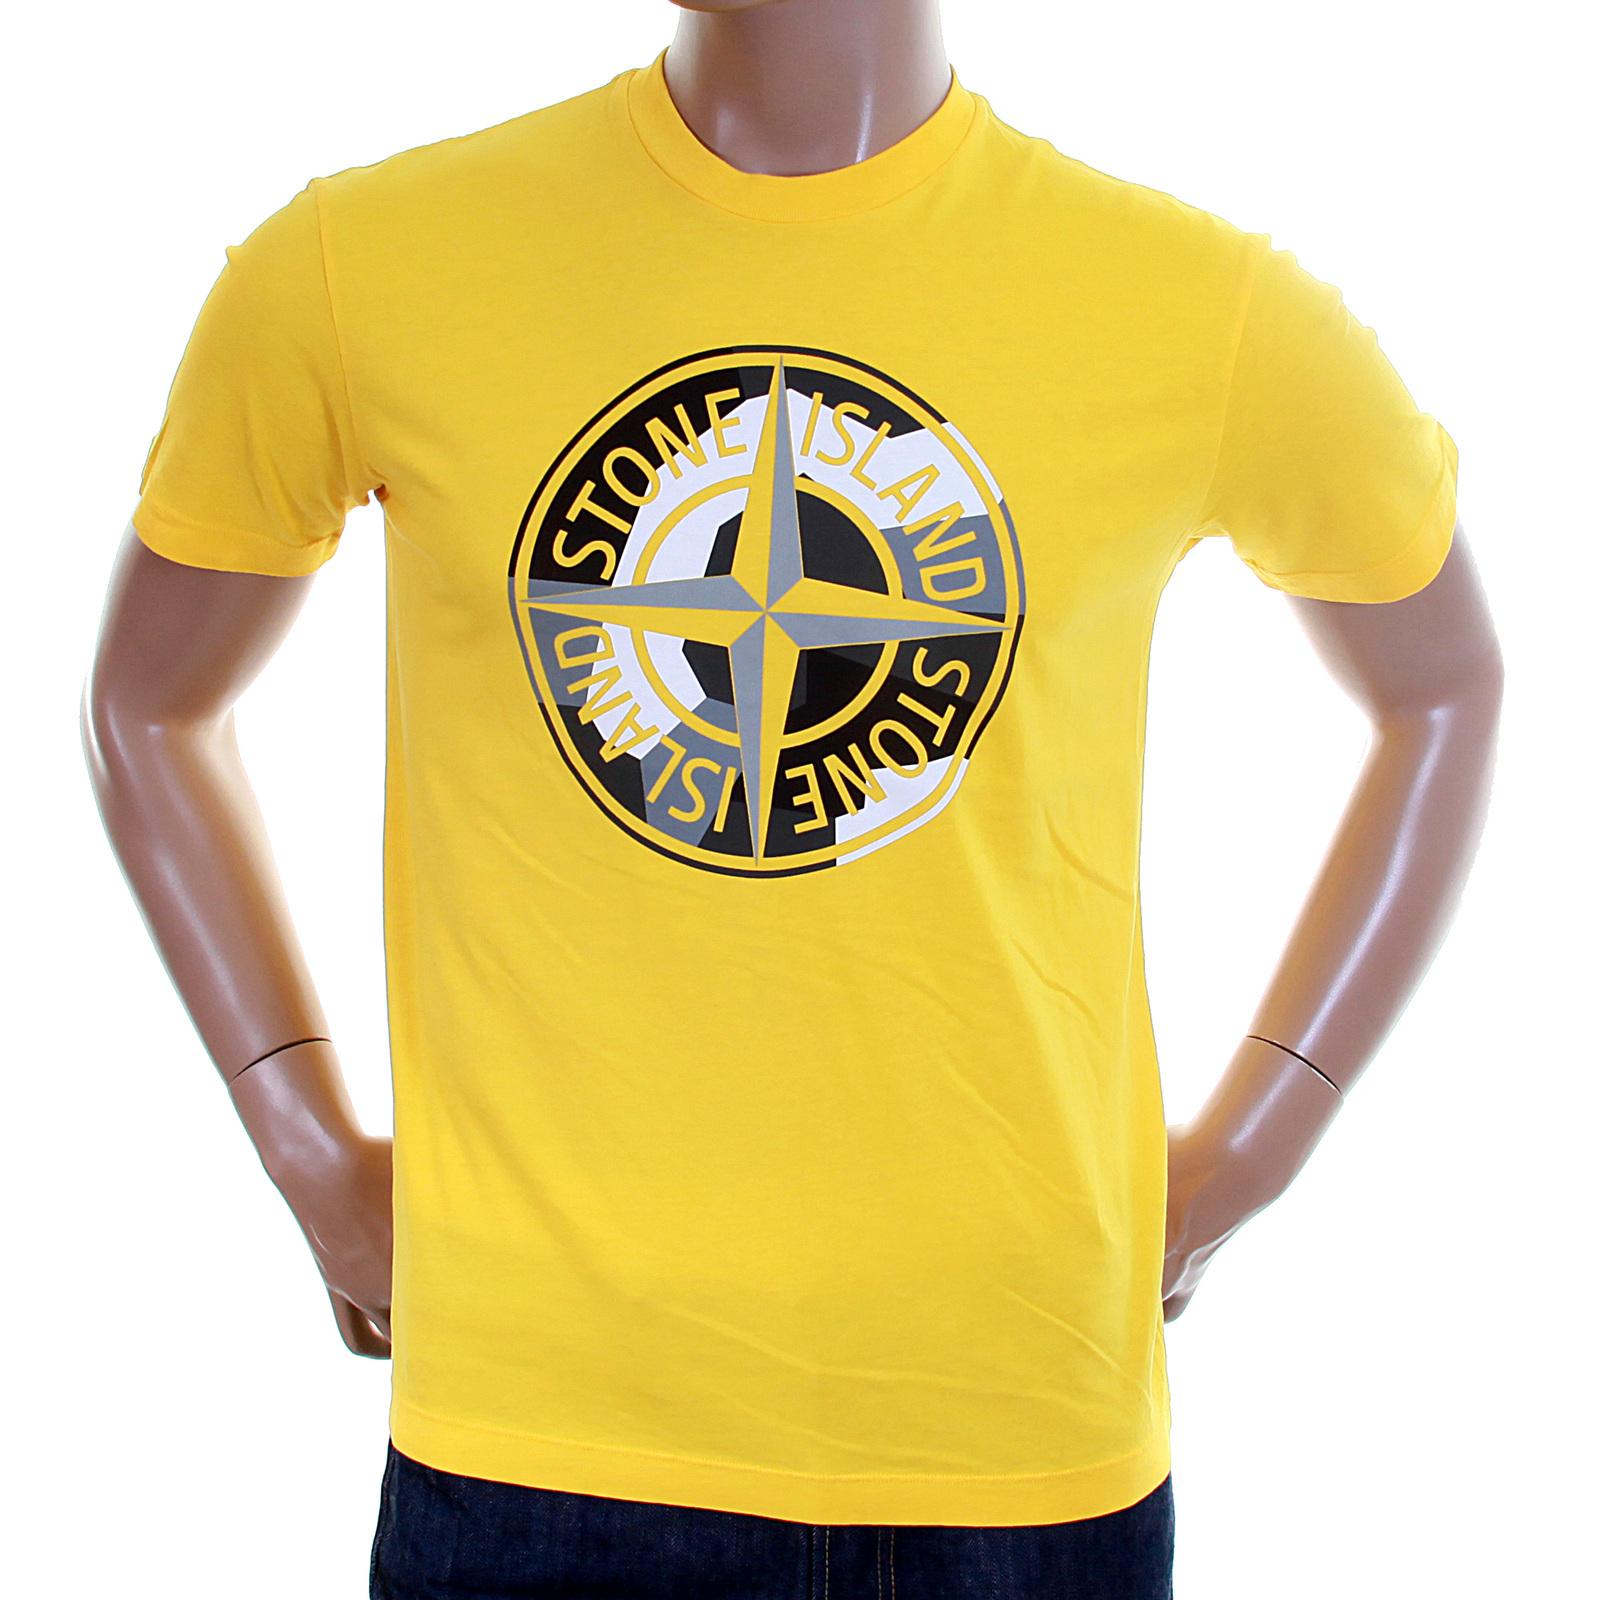 Stone island mens yellow 571520183 compass logo tee shirt for My logo on a shirt